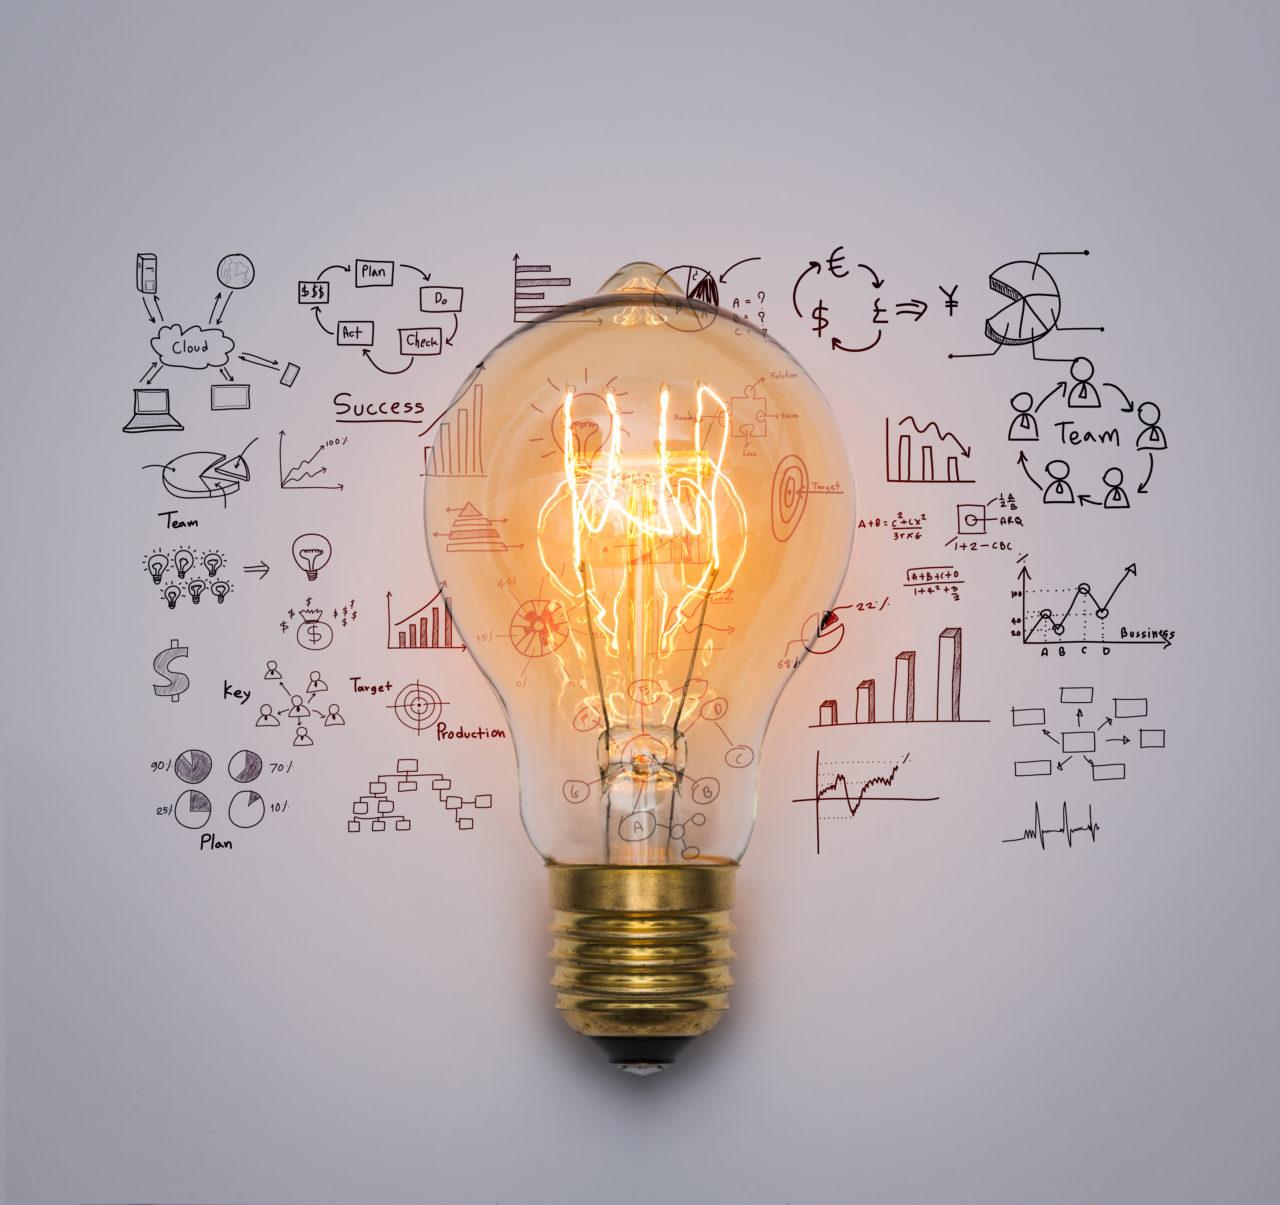 https://www.louisdavidbenyayer.com/wp-content/uploads/2020/10/light-bulb-with-drawing-graph-1280x1205.jpg